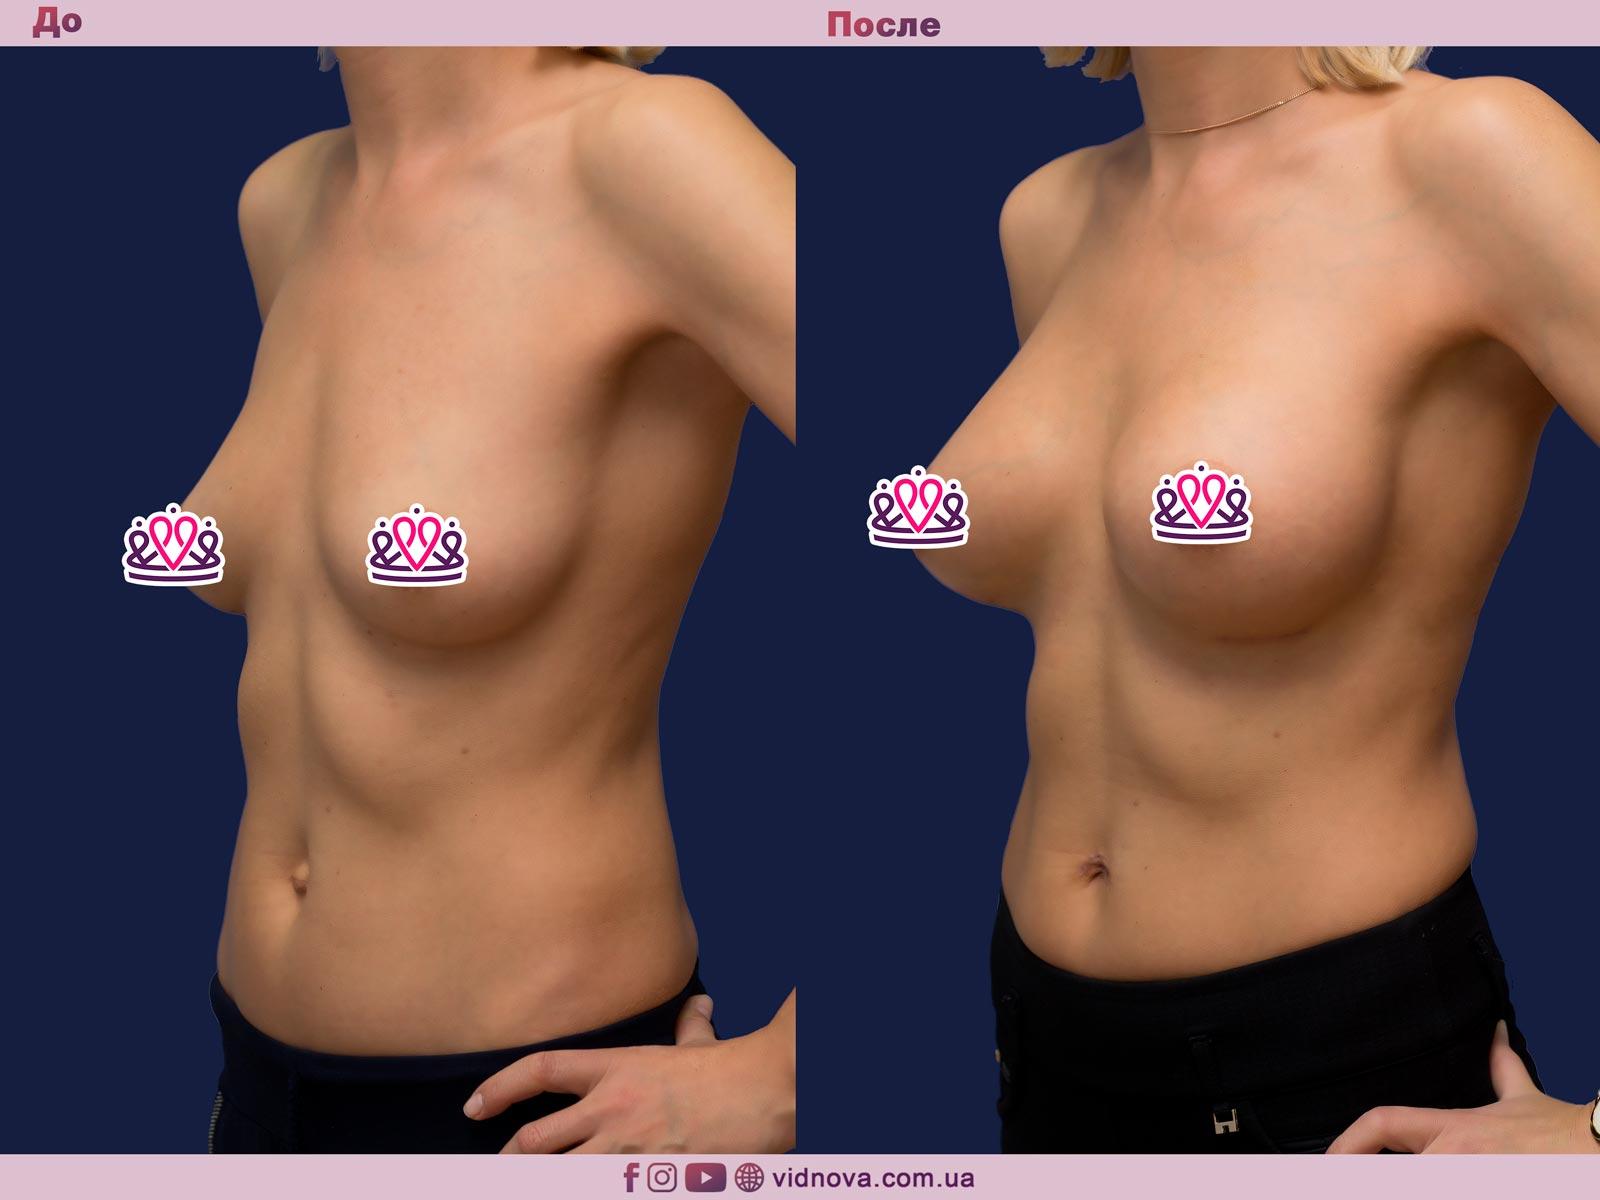 Увеличение груди: Фото ДО и ПОСЛЕ - Пример №81-2 - Клиника Vidnova